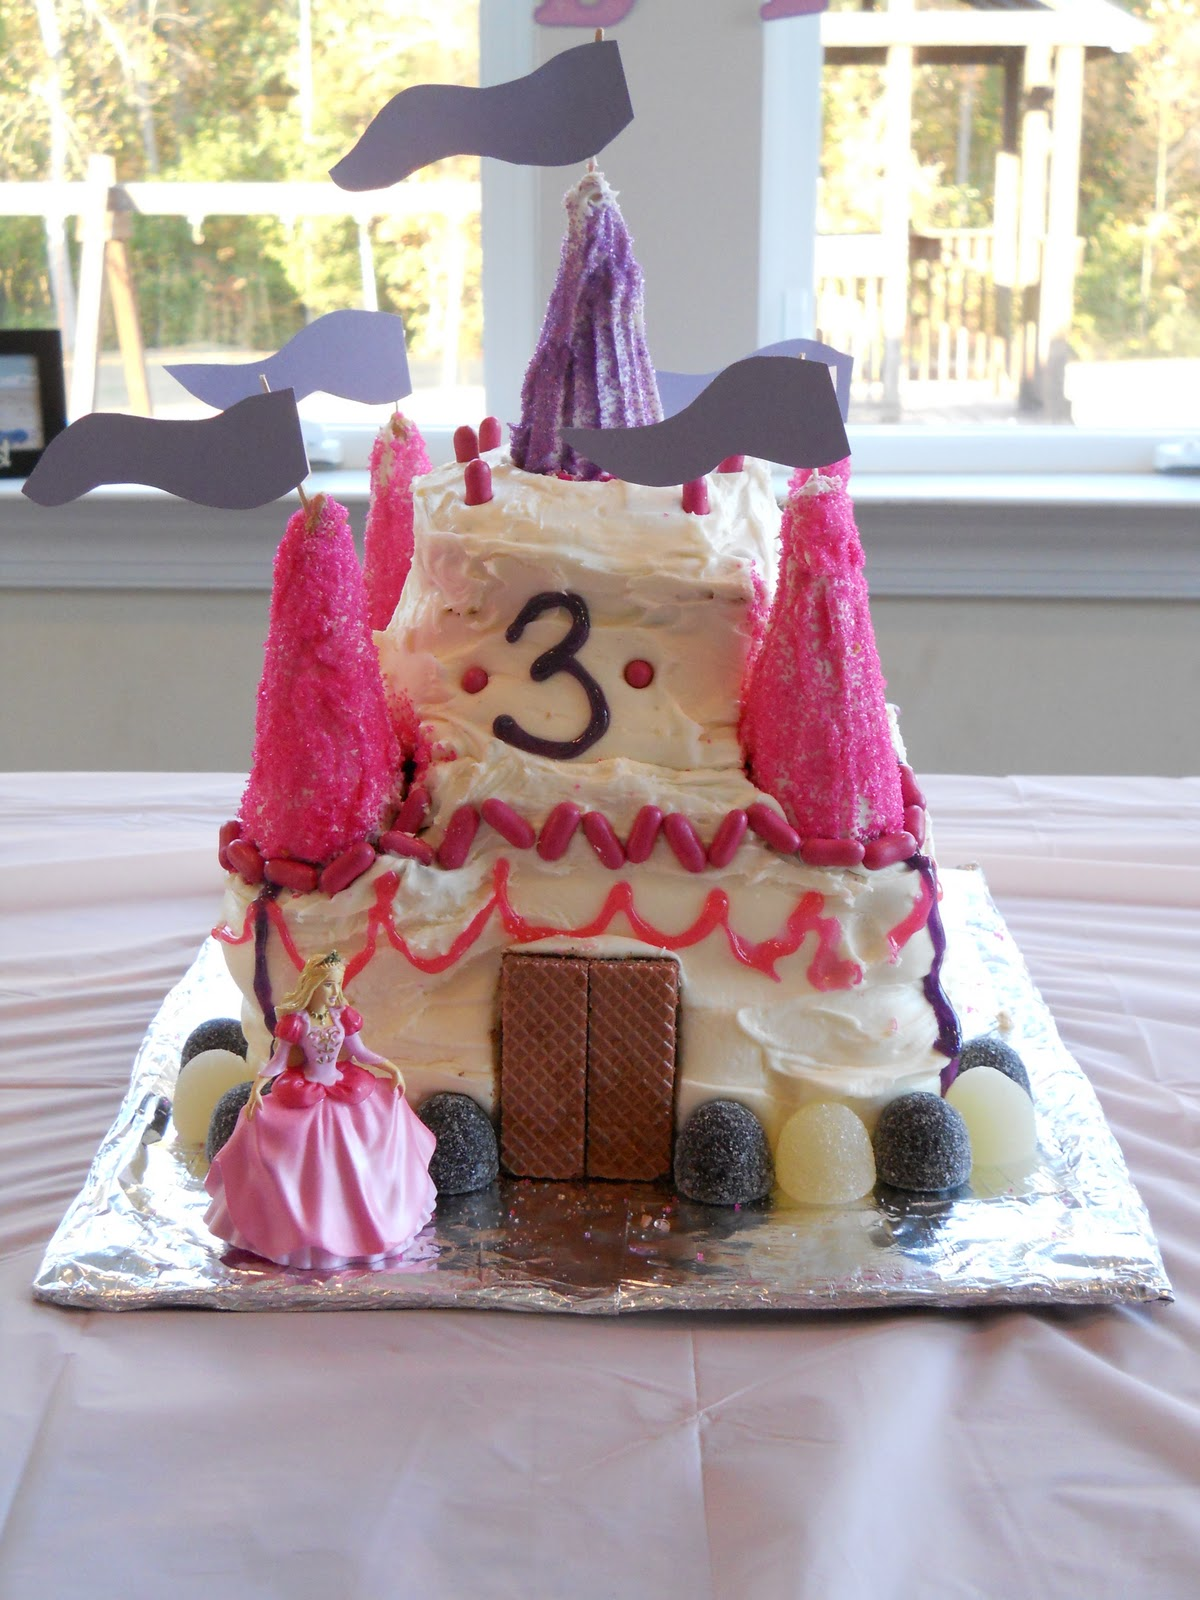 Ice Castle Cake From Frozen